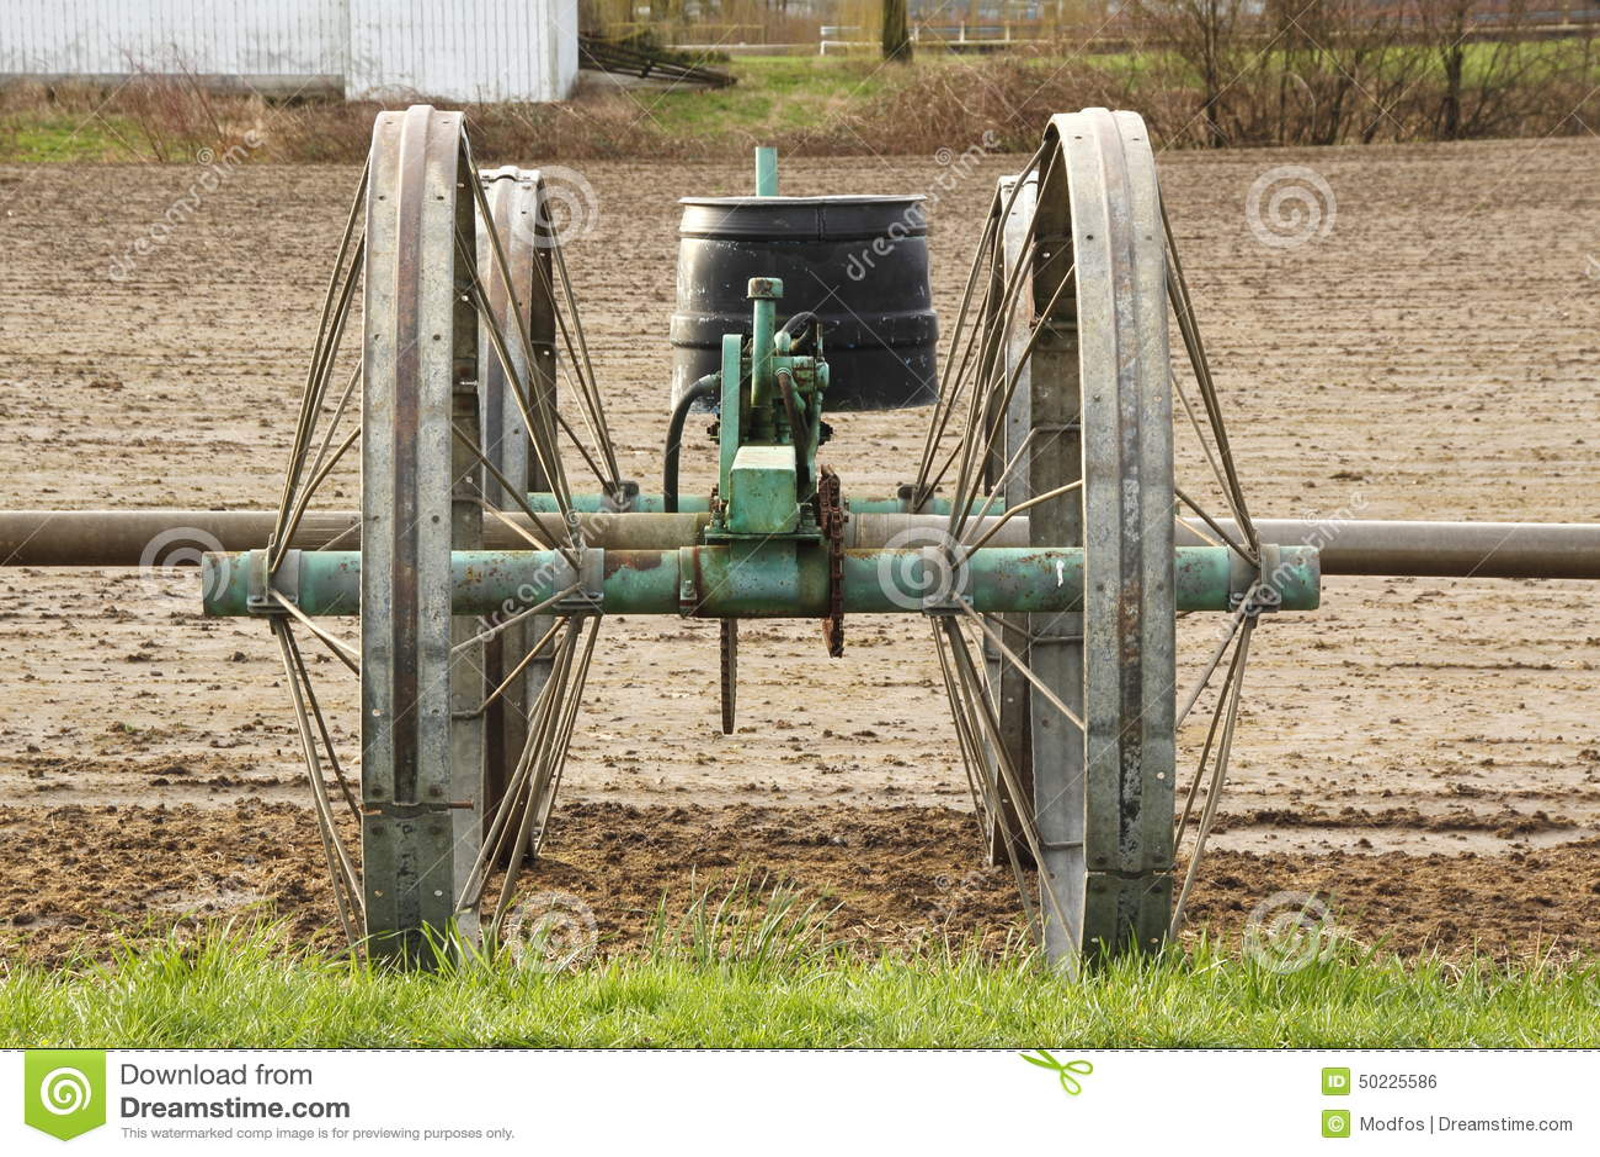 Pompa idraulica per irrigazione agricola fotografia stock for Pompa per irrigazione